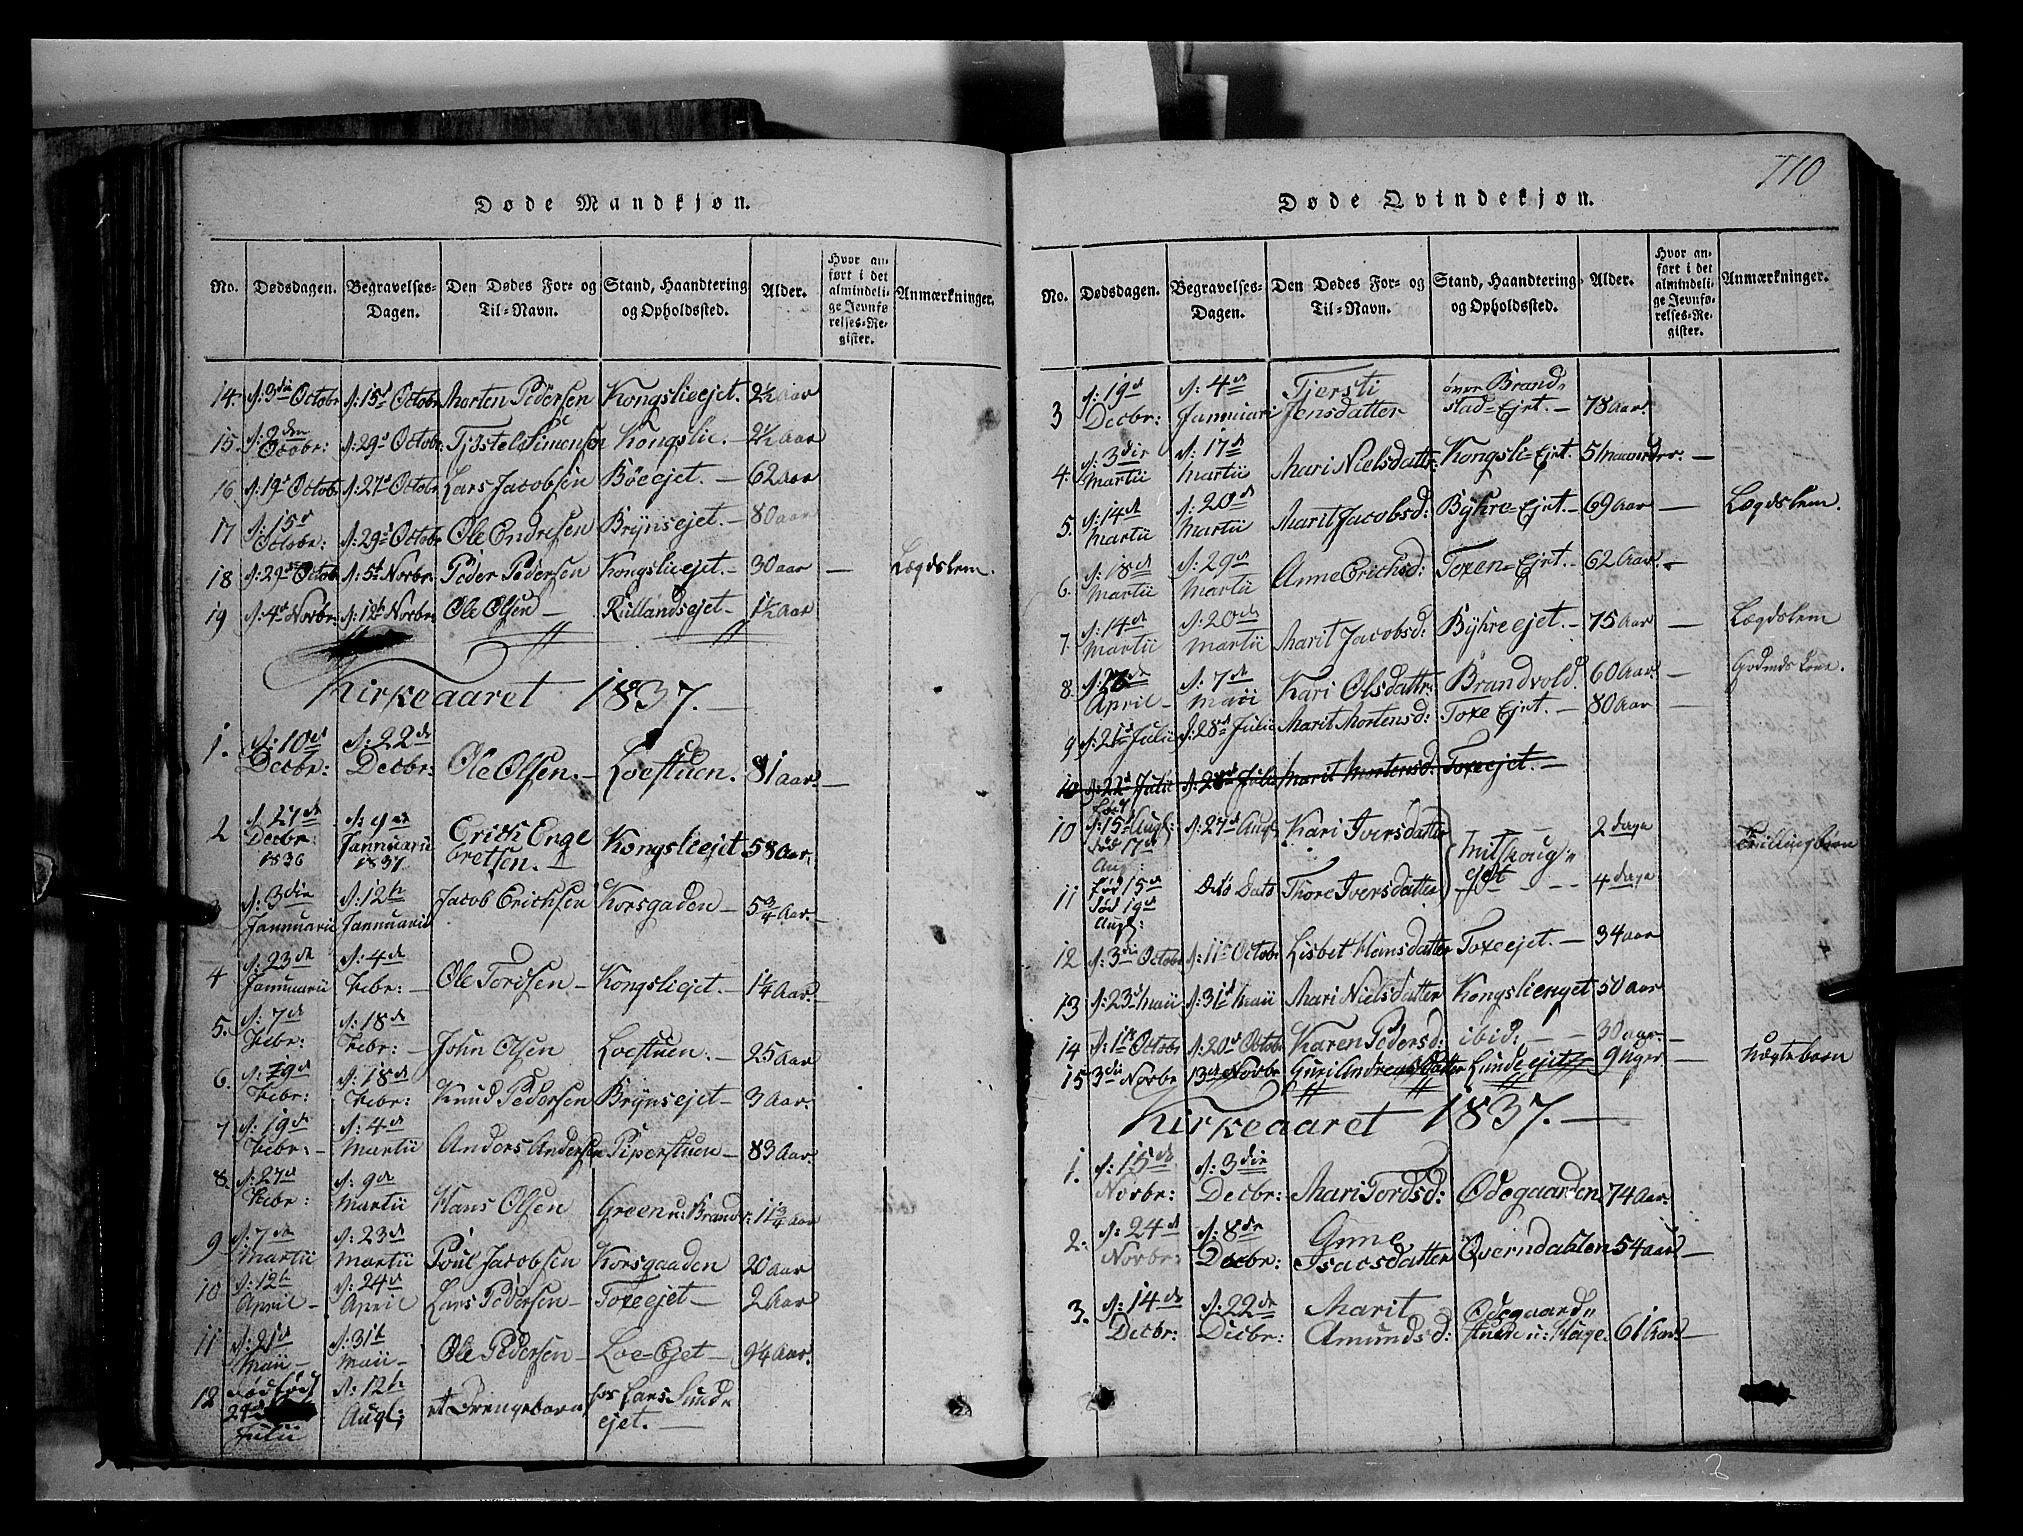 SAH, Fron prestekontor, H/Ha/Hab/L0004: Klokkerbok nr. 4, 1816-1850, s. 110